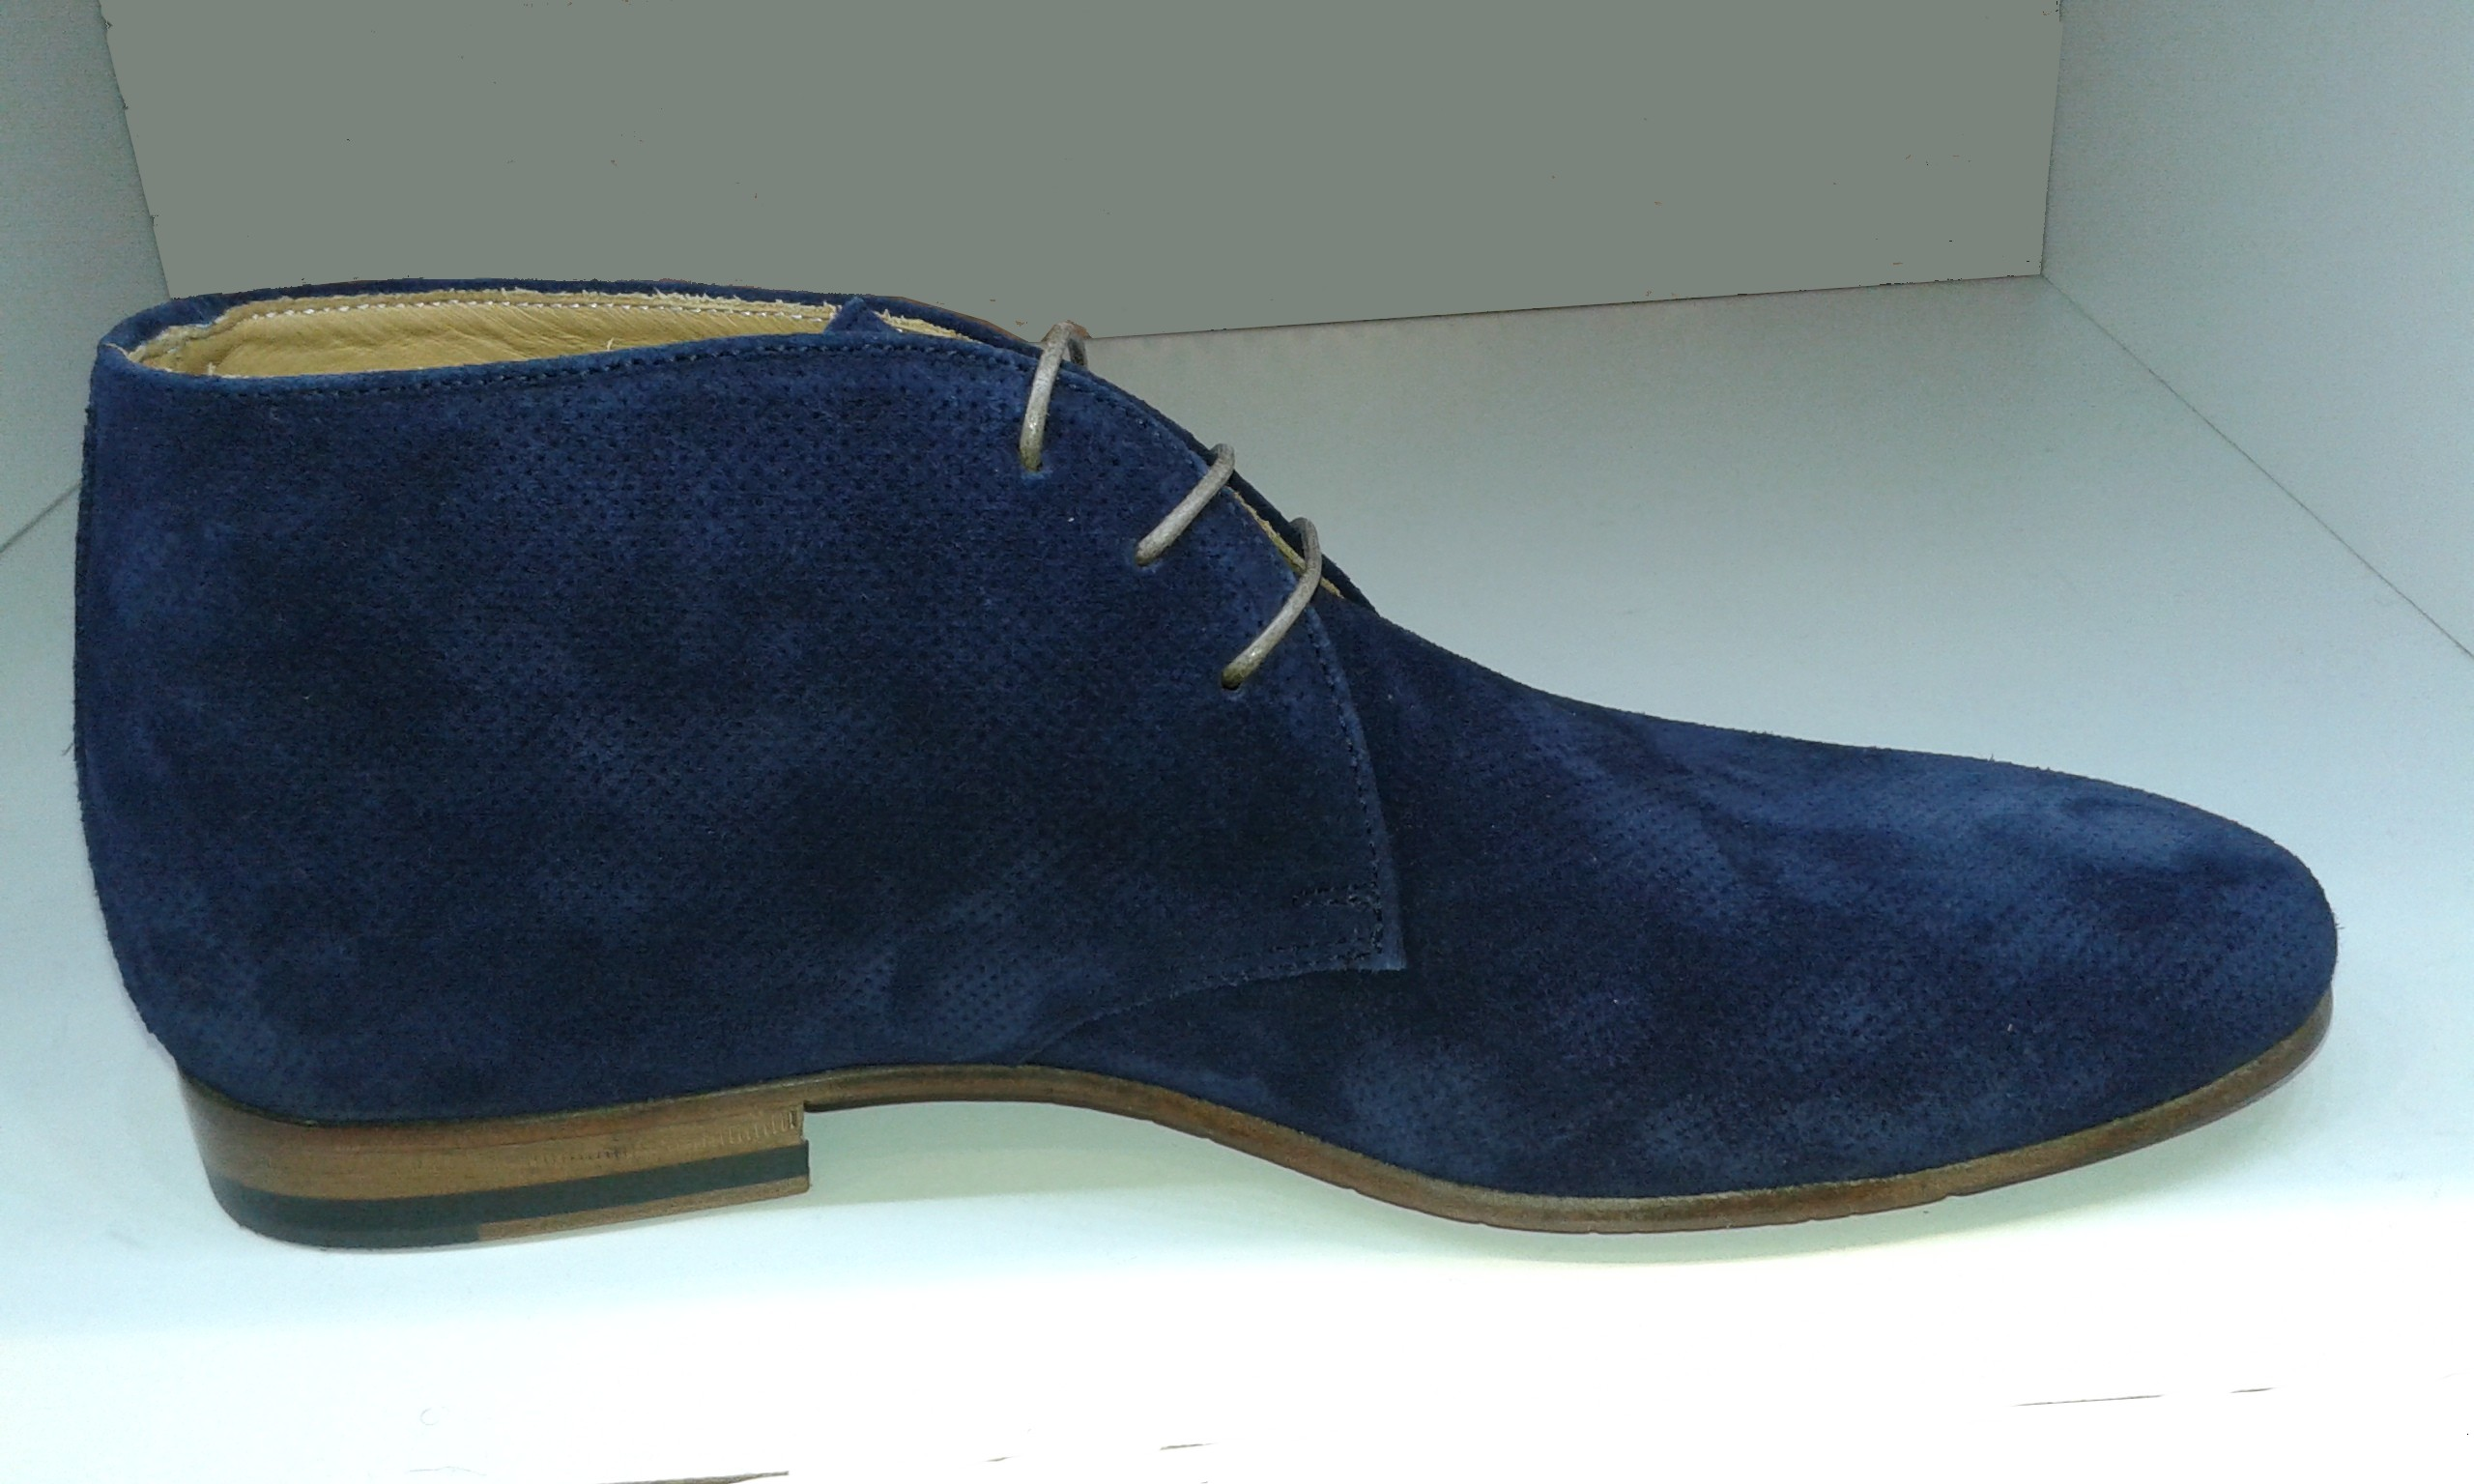 13039c7ffa3ef9 Chaussures italienne nubuck perforé bleu marine